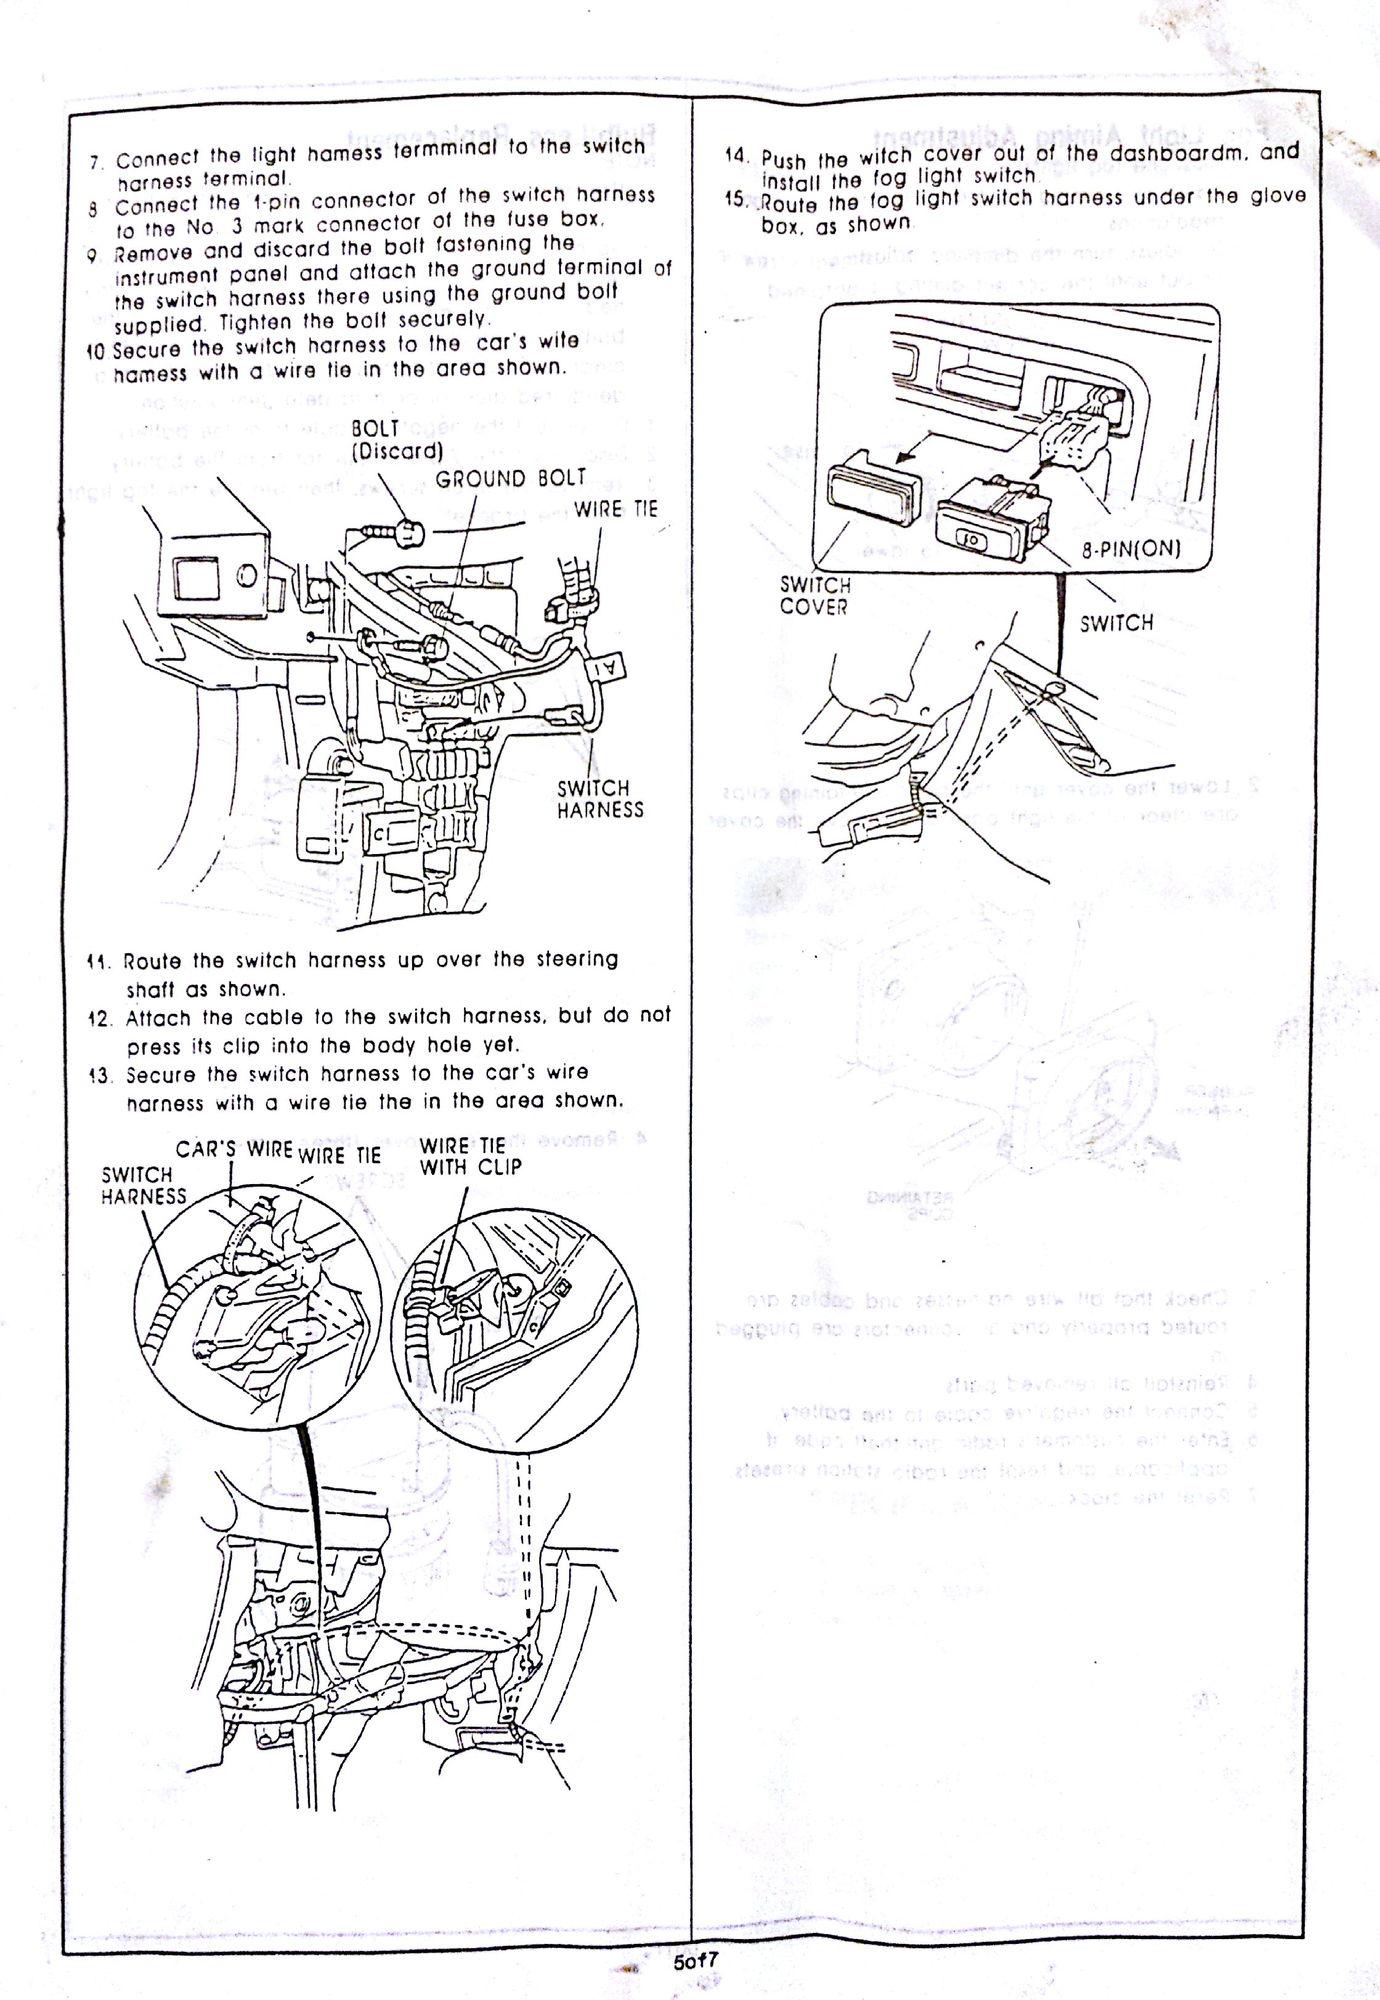 80 94_95_foglight_6_4f7be40464e175f13c69d1db595bc669cd4331a3 avital keyless entry wiring diagram dolgular com xk05 wiring diagram at bayanpartner.co